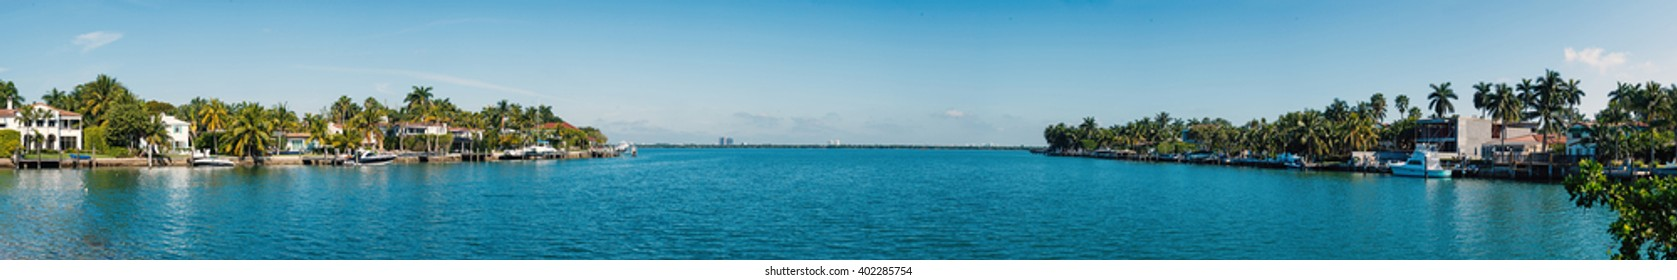 Panoramic image of Venetian Islands in Miami Beach. Florida, USA.